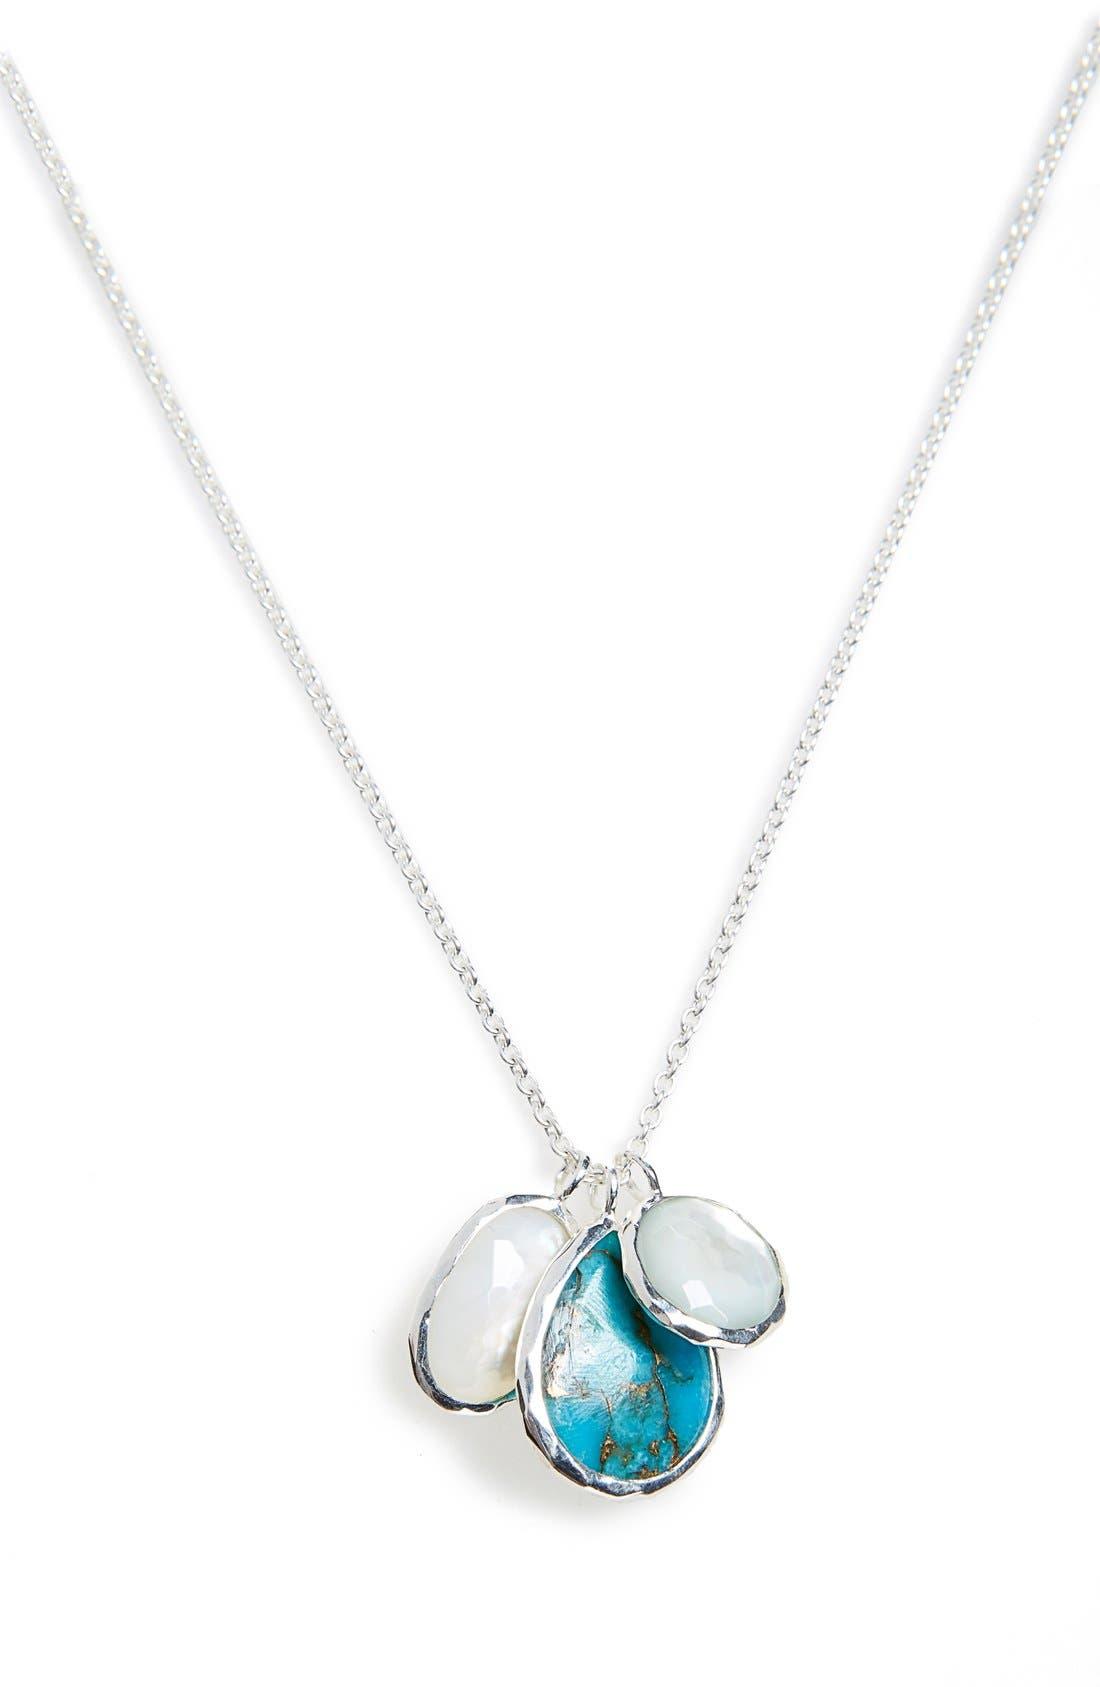 Alternate Image 1 Selected - Ippolita 'Wonderland' Triple Charm Necklace (Nordstrom Exclusive)